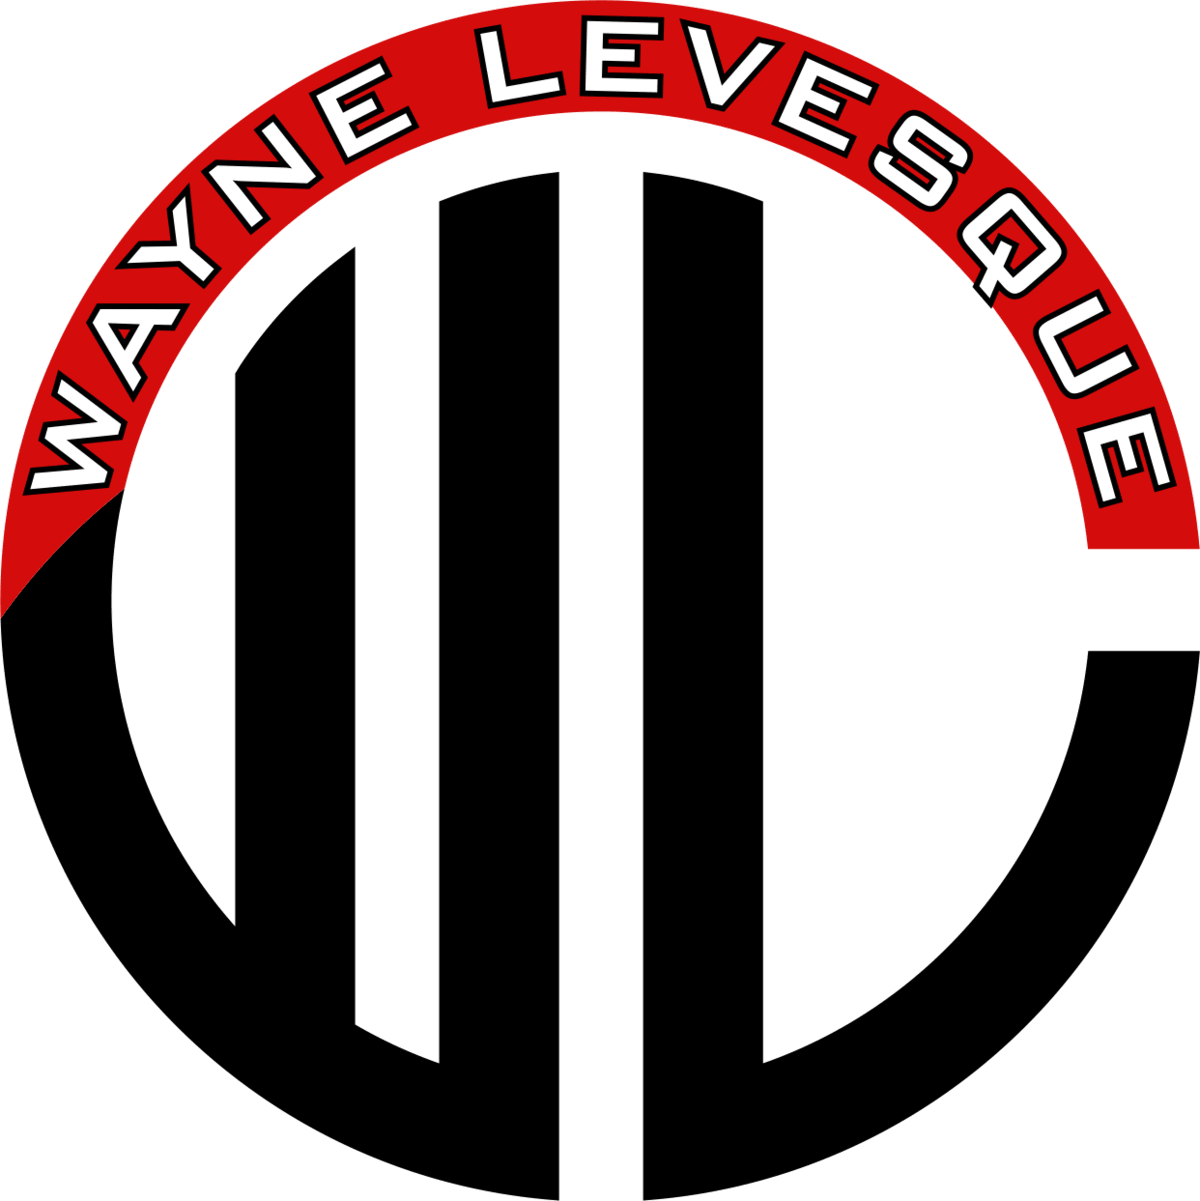 Wayne Levesque Music